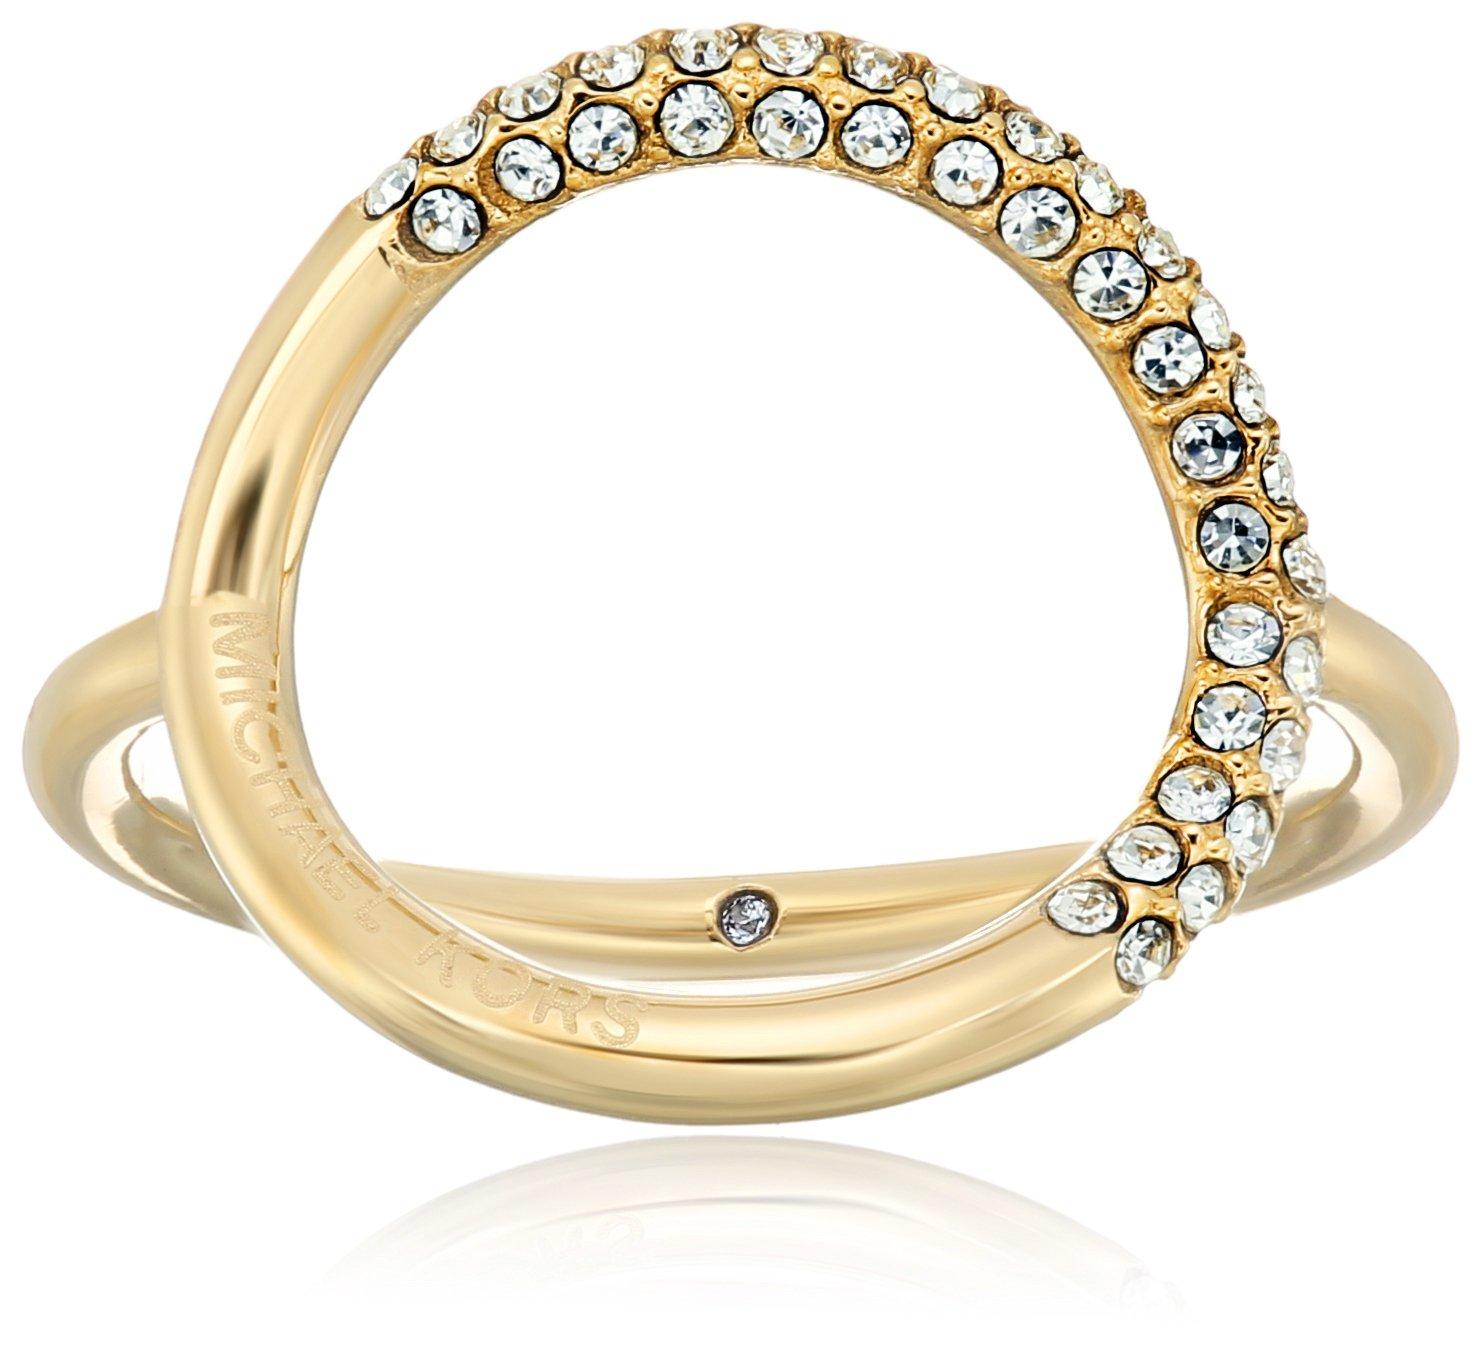 Michael Kors Brilliance Gold Banded Circle Ring, Size 7